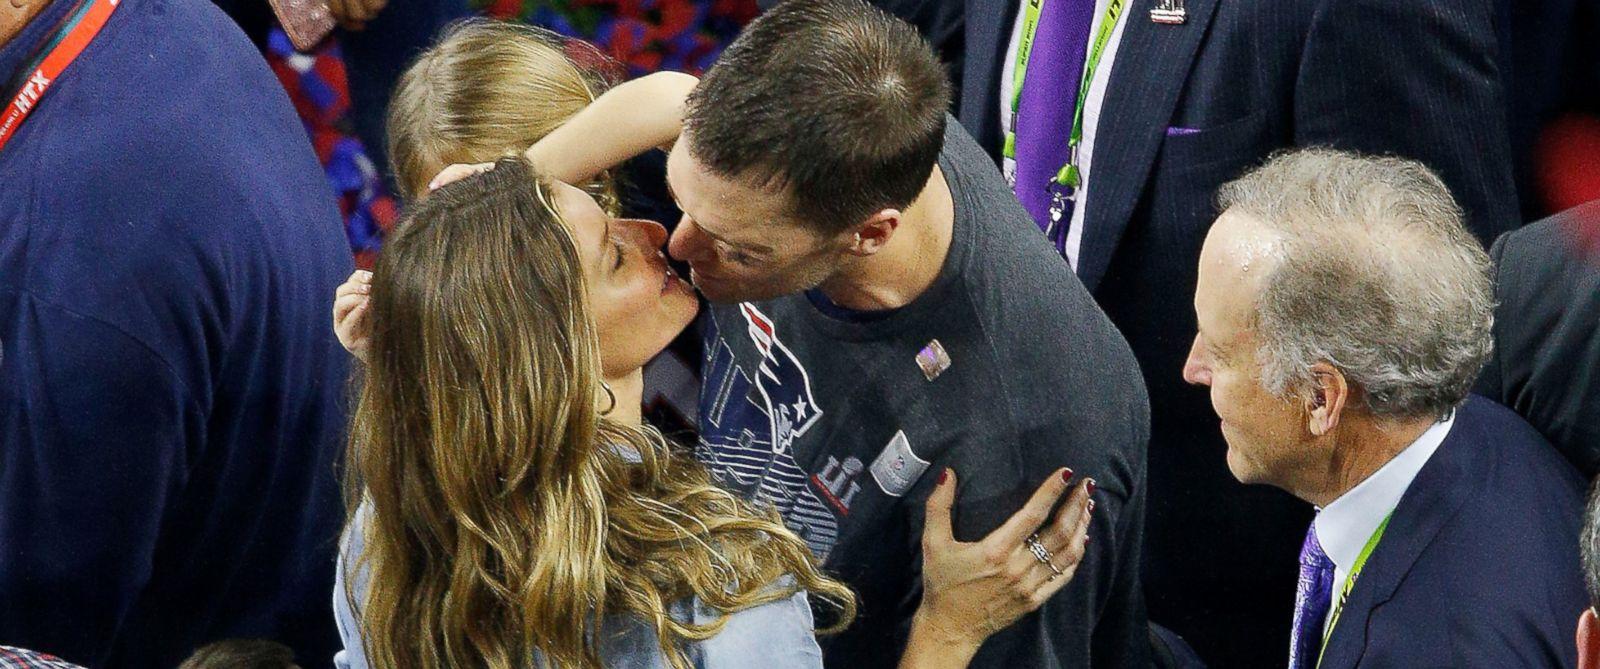 How Tom Brady And Gisele Bundchen Celebrated Patriots